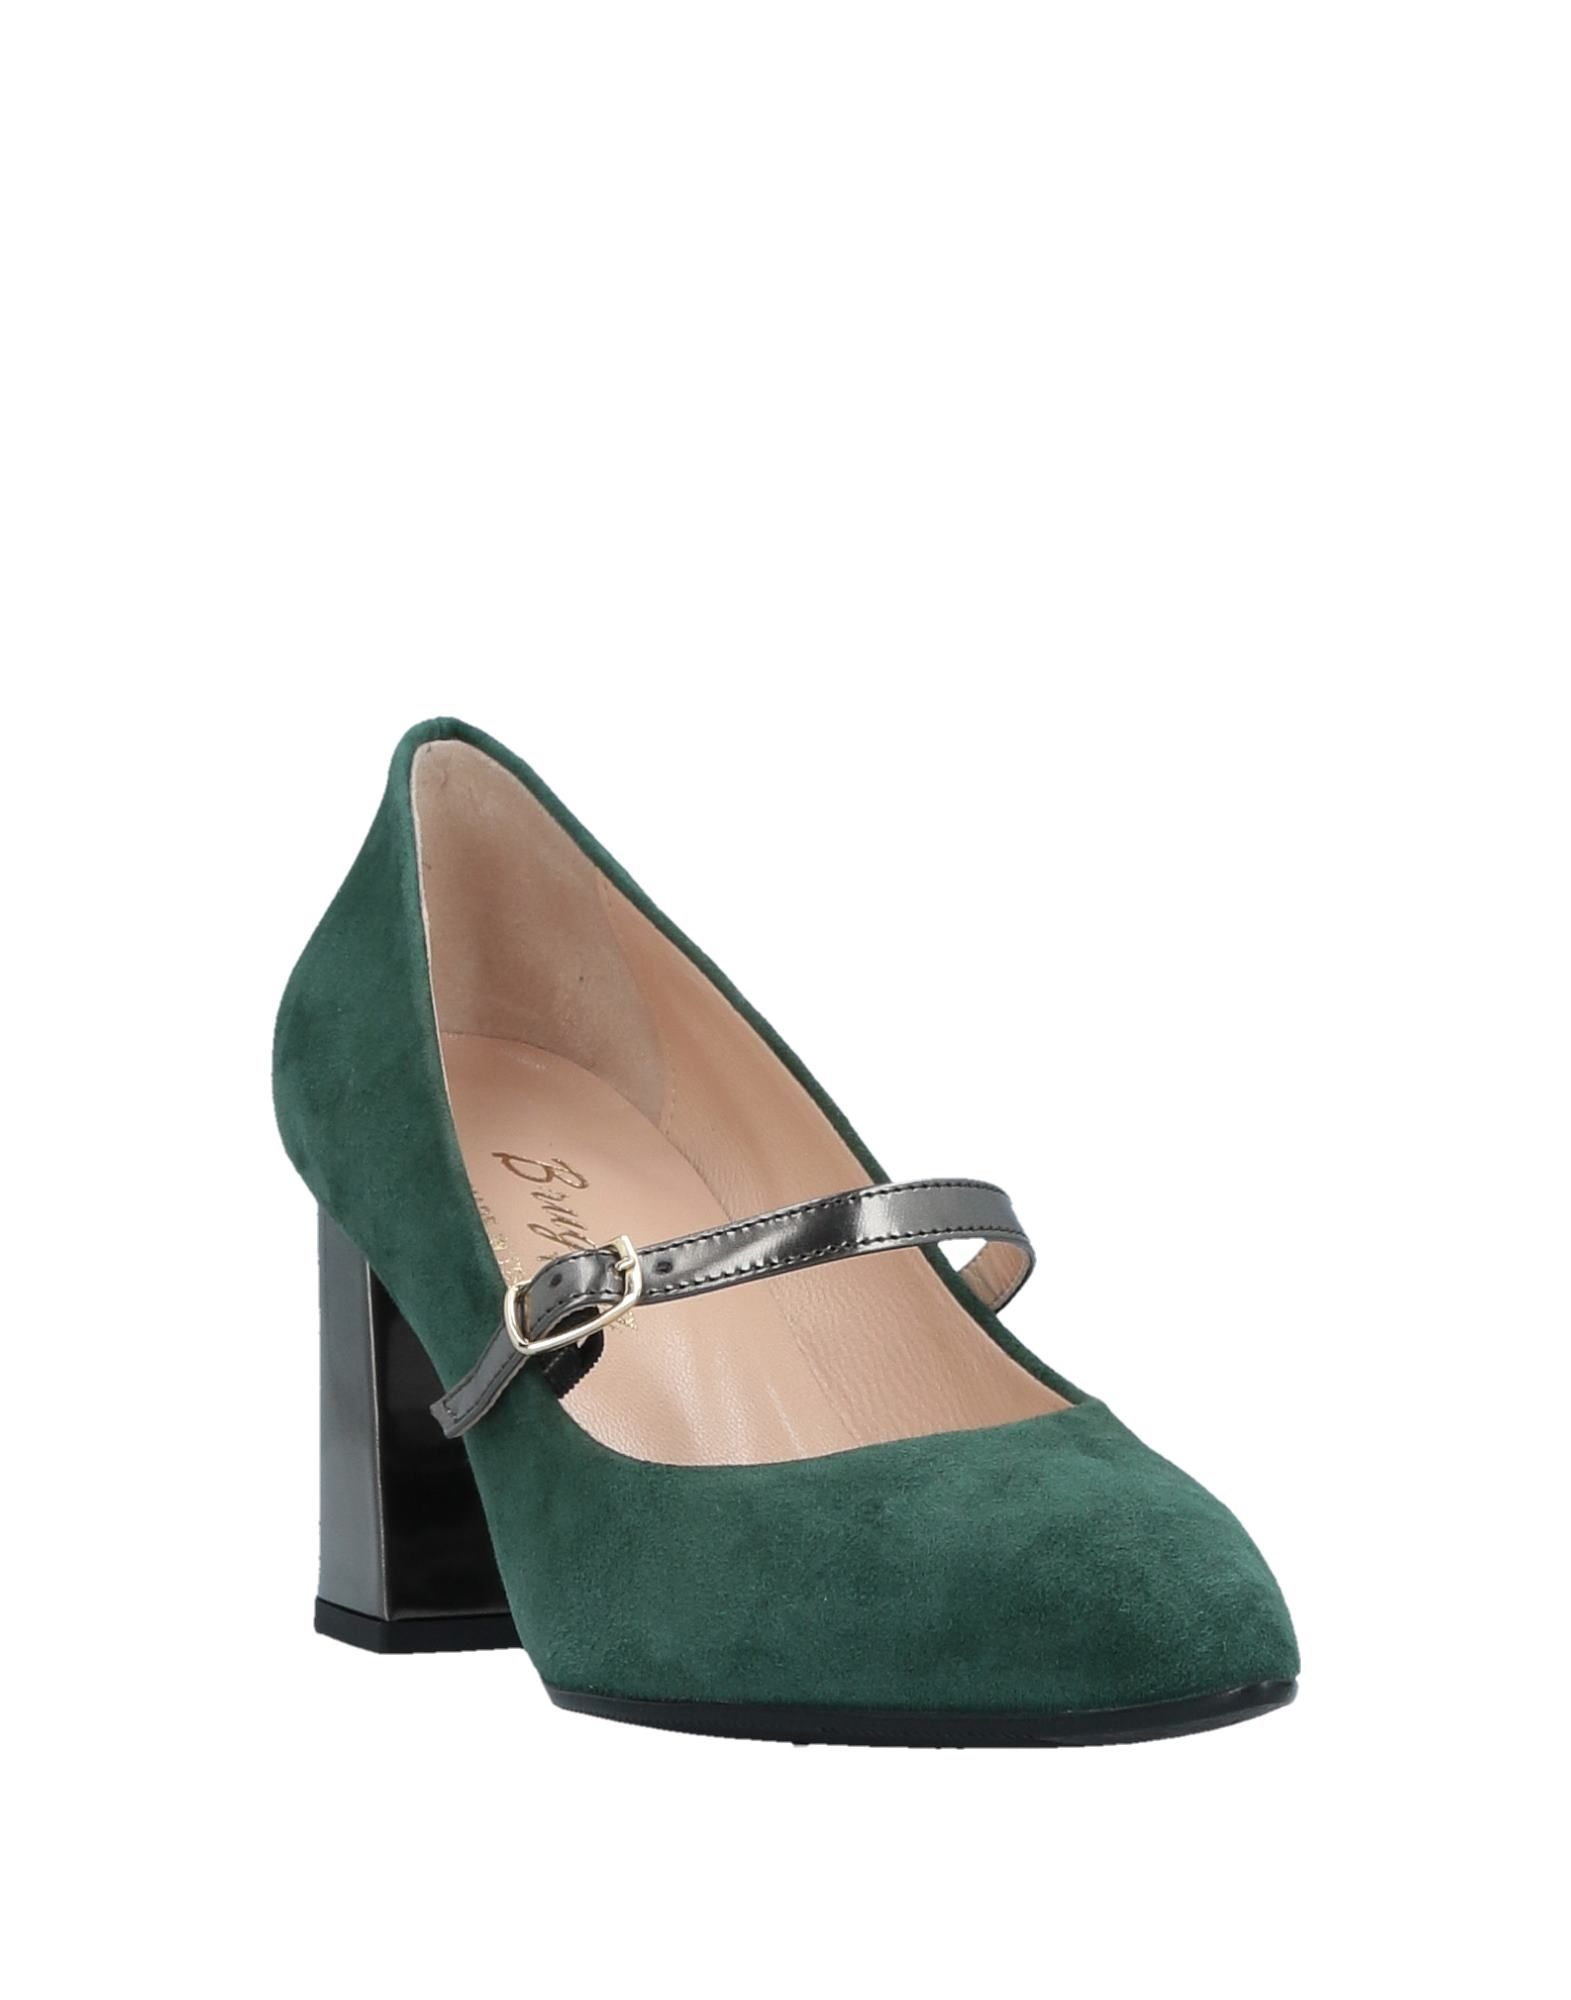 Stilvolle Stilvolle Stilvolle billige Schuhe F.Lli Bruglia Pumps Damen  11520217PX c7e883